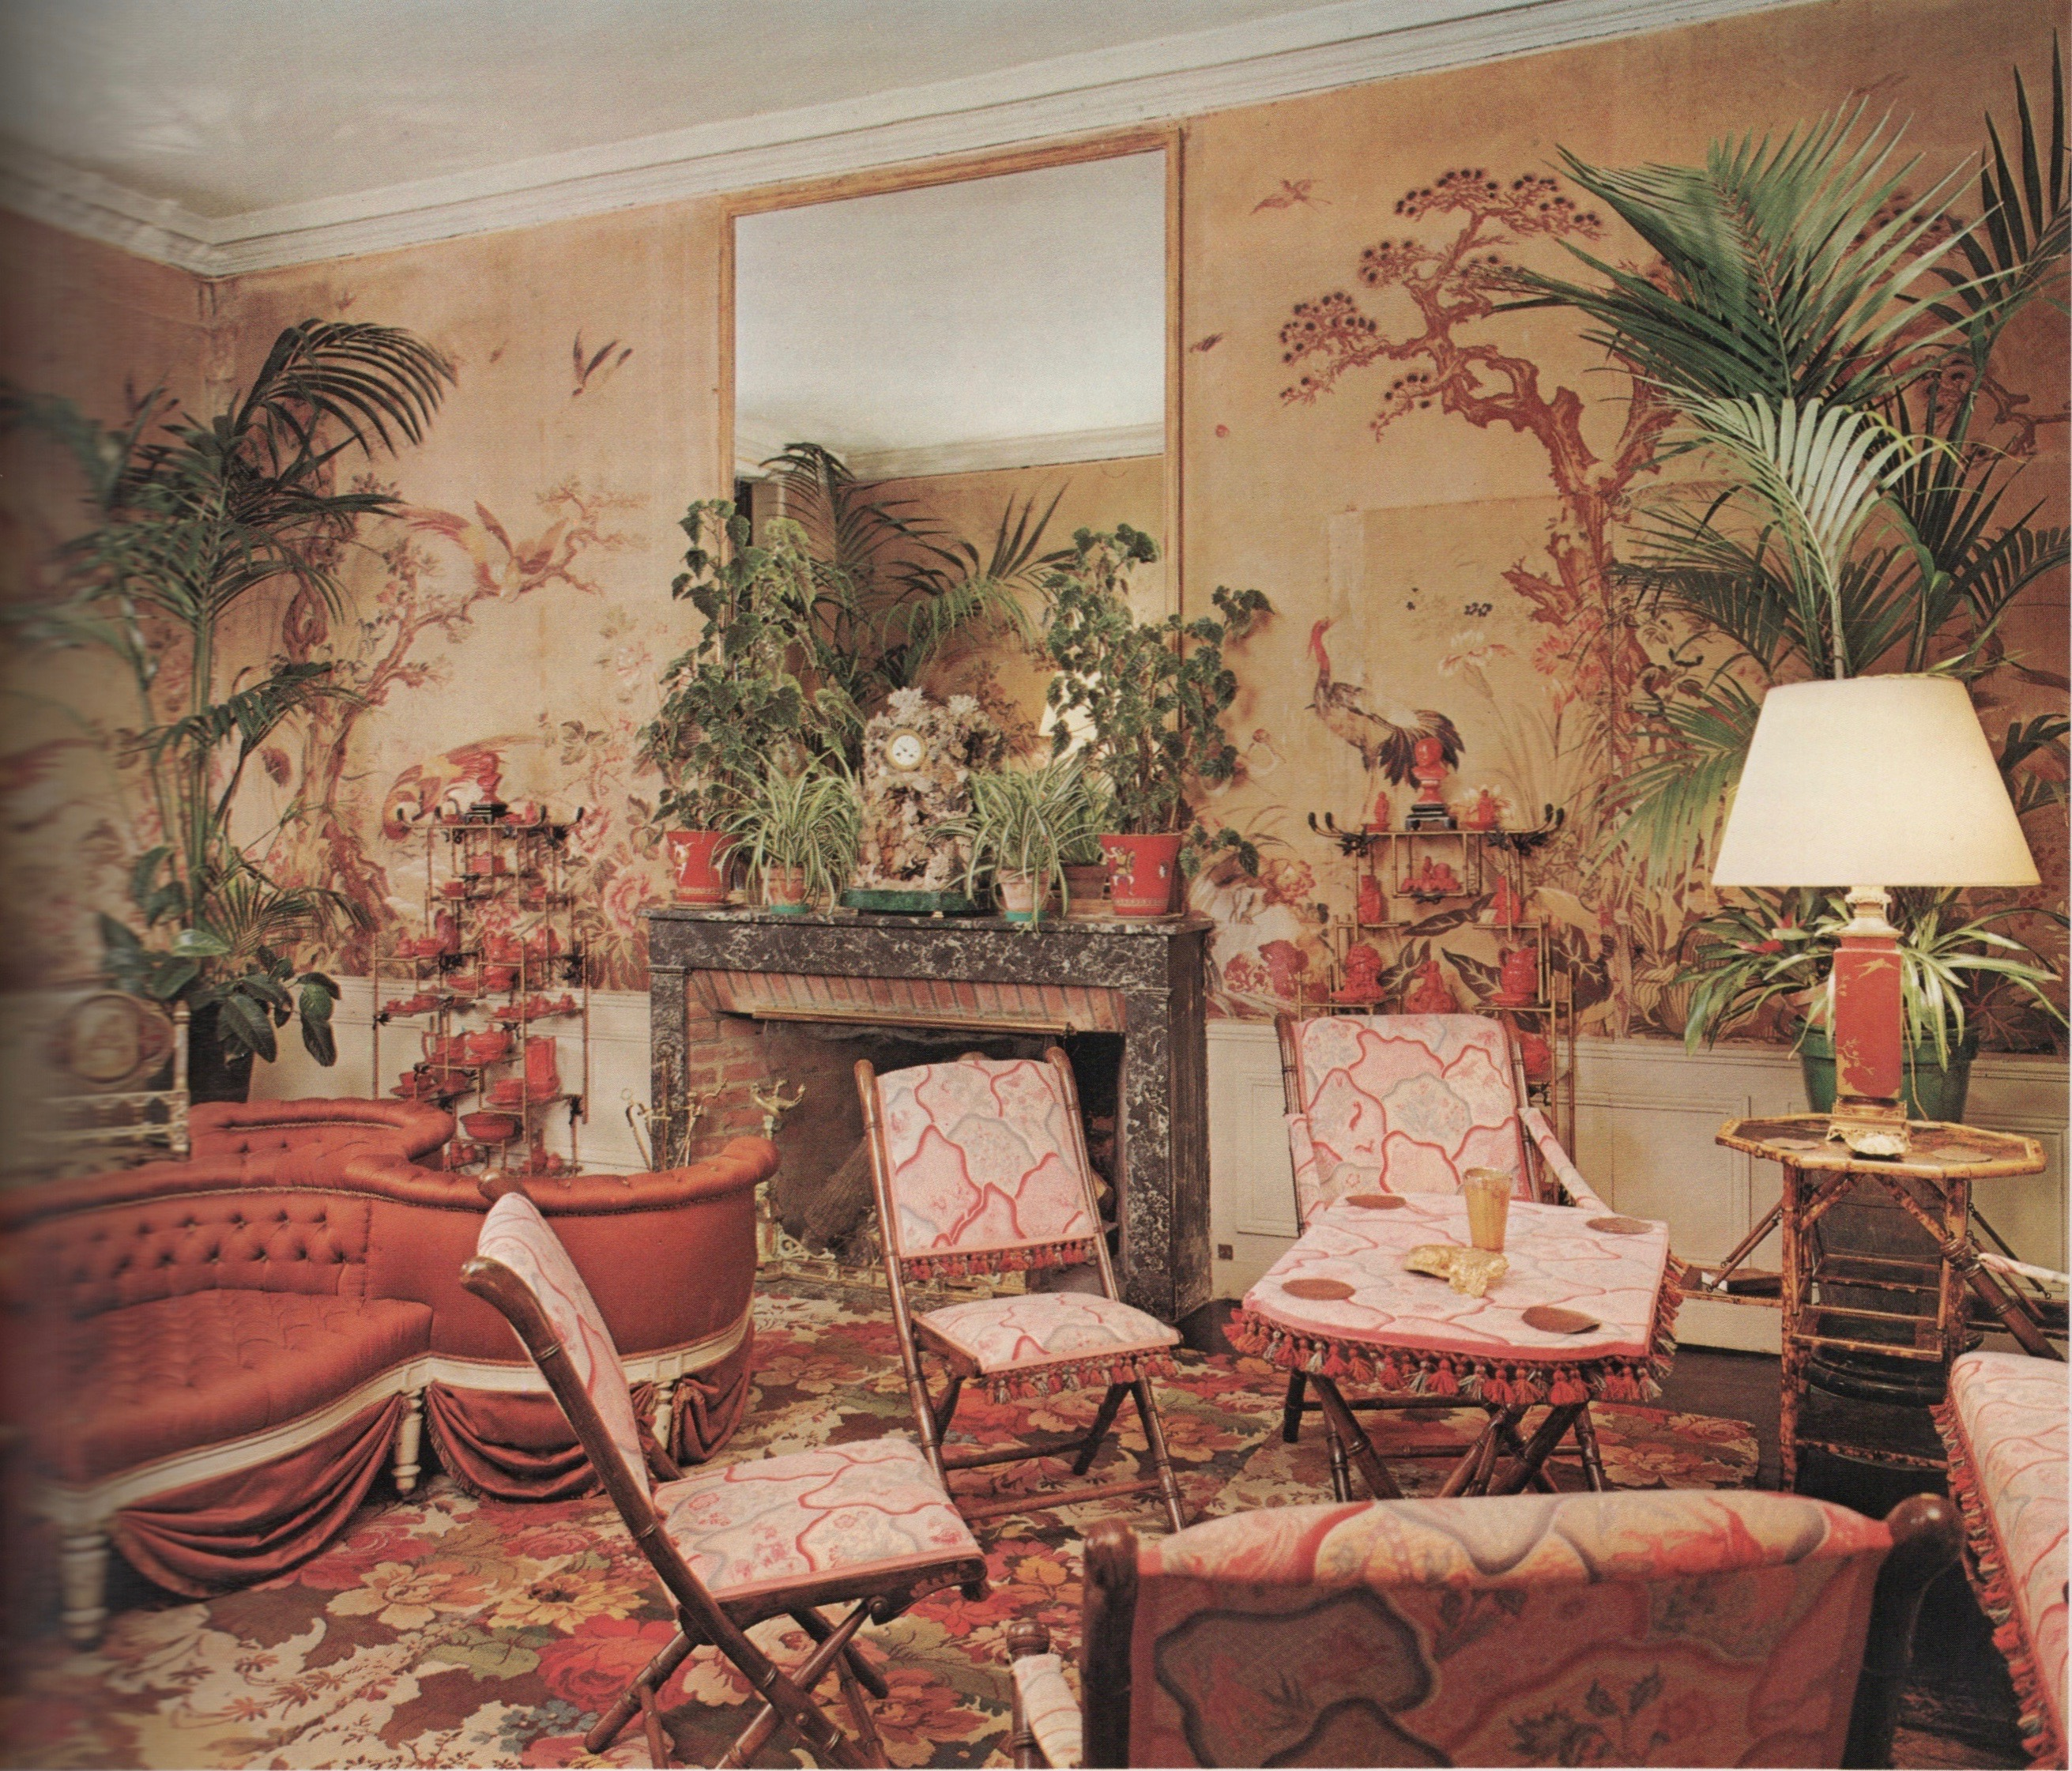 Winter Gardens Cristopher Worthland Interiors